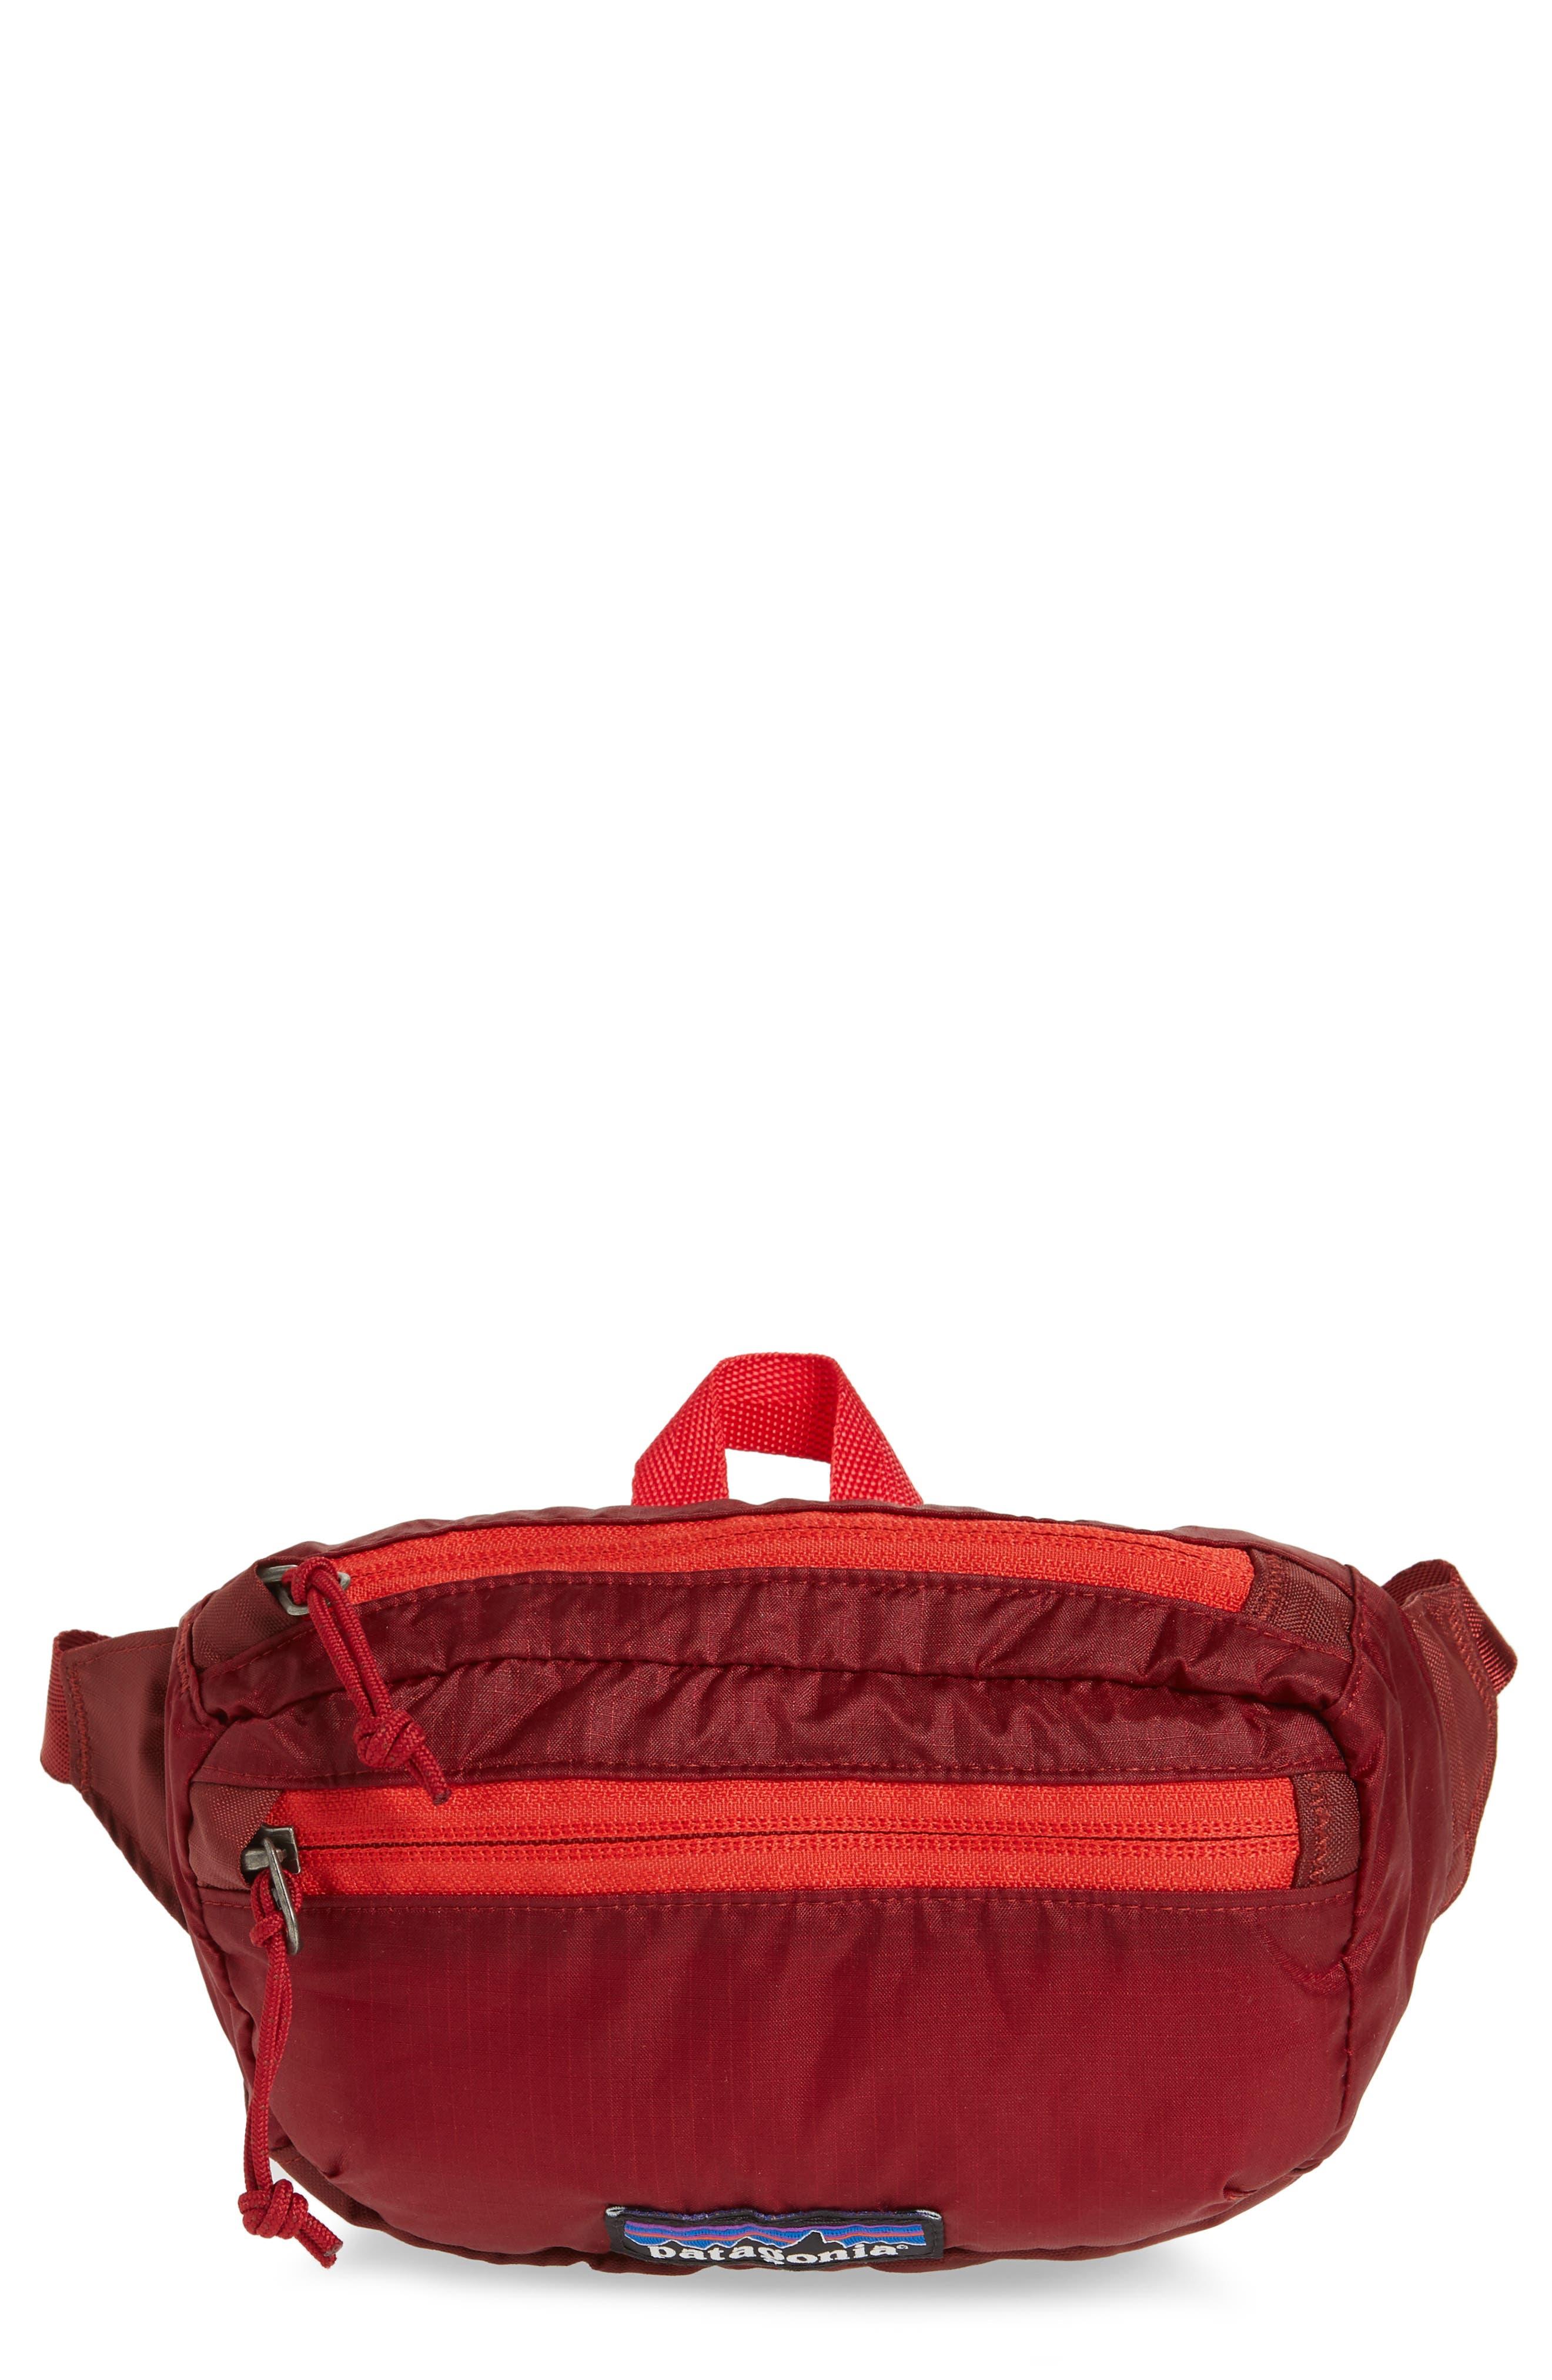 Travel Belt Bag,                             Main thumbnail 5, color,